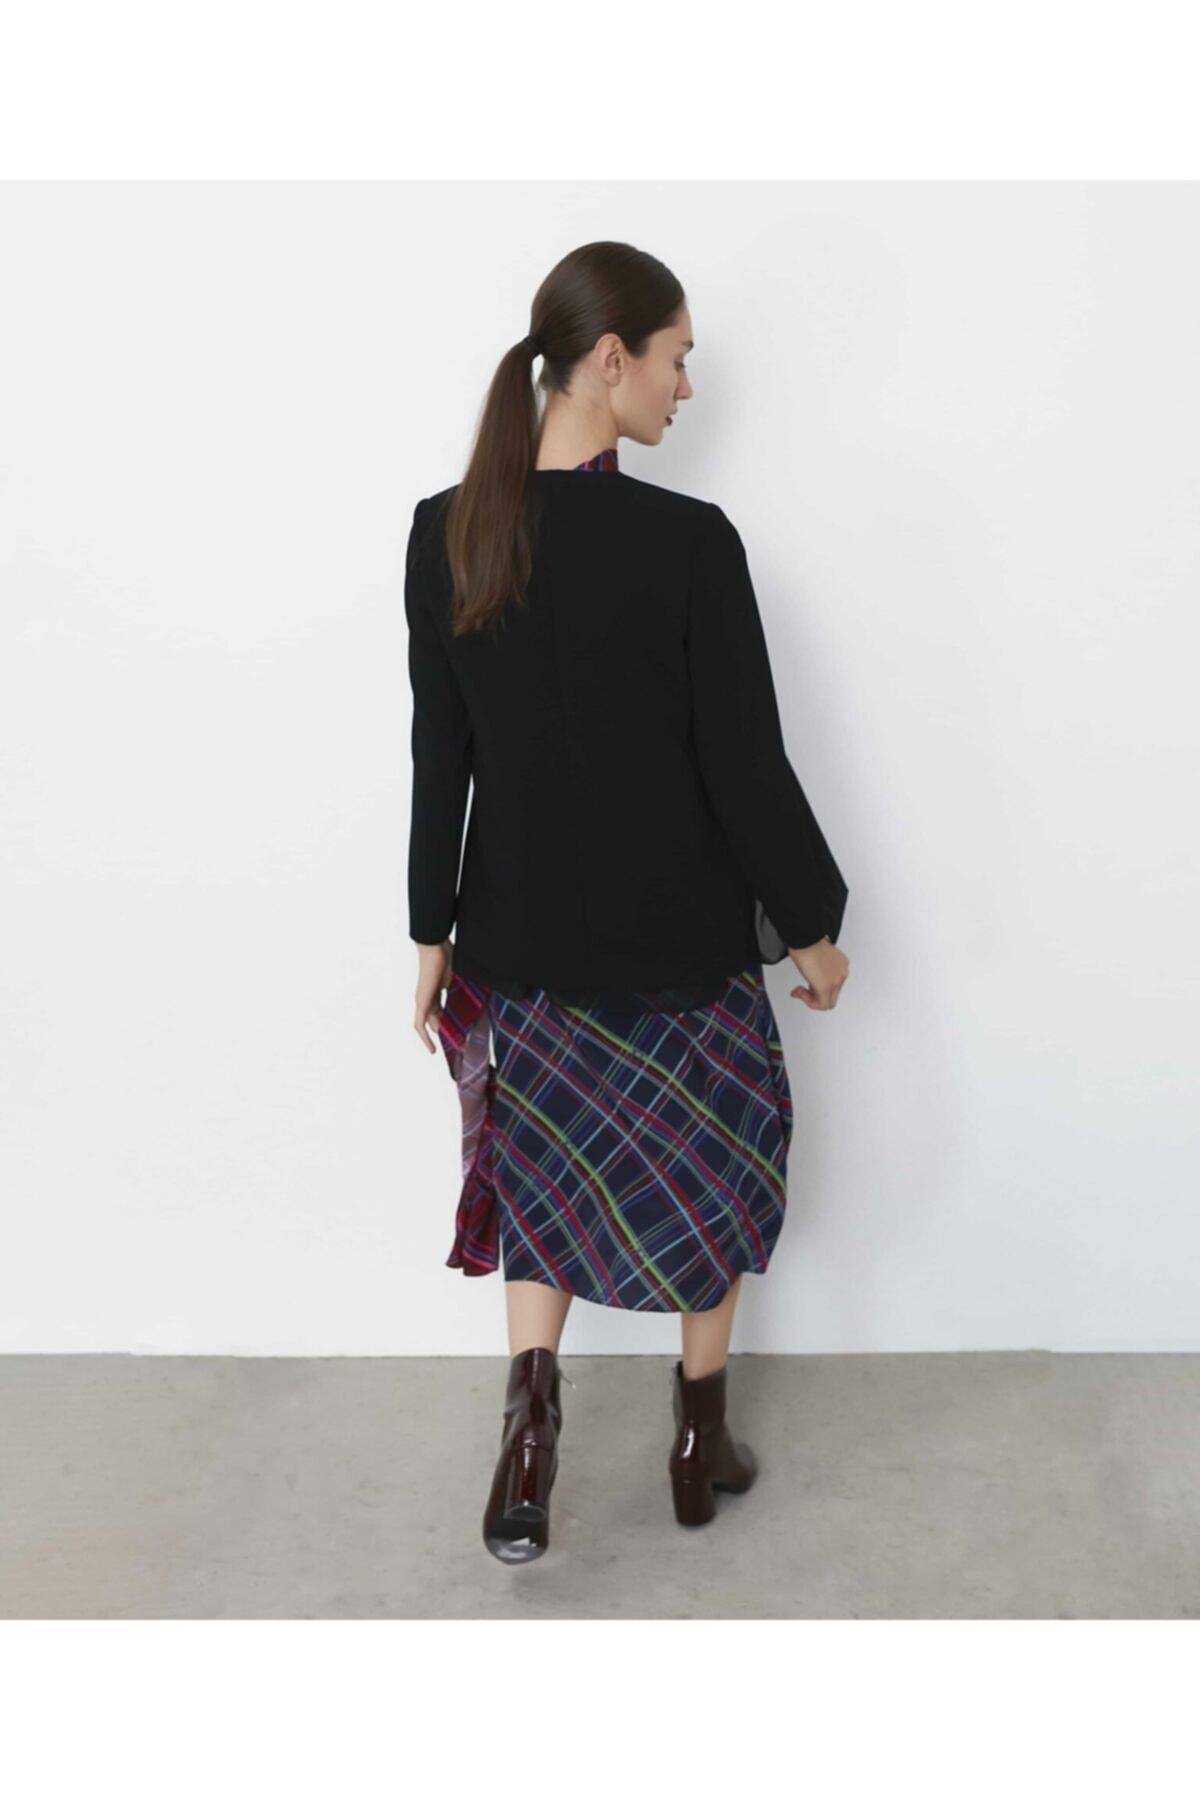 İpekyol Kadın Siyah Şifon Mixli Ceket IW6190005075001 2